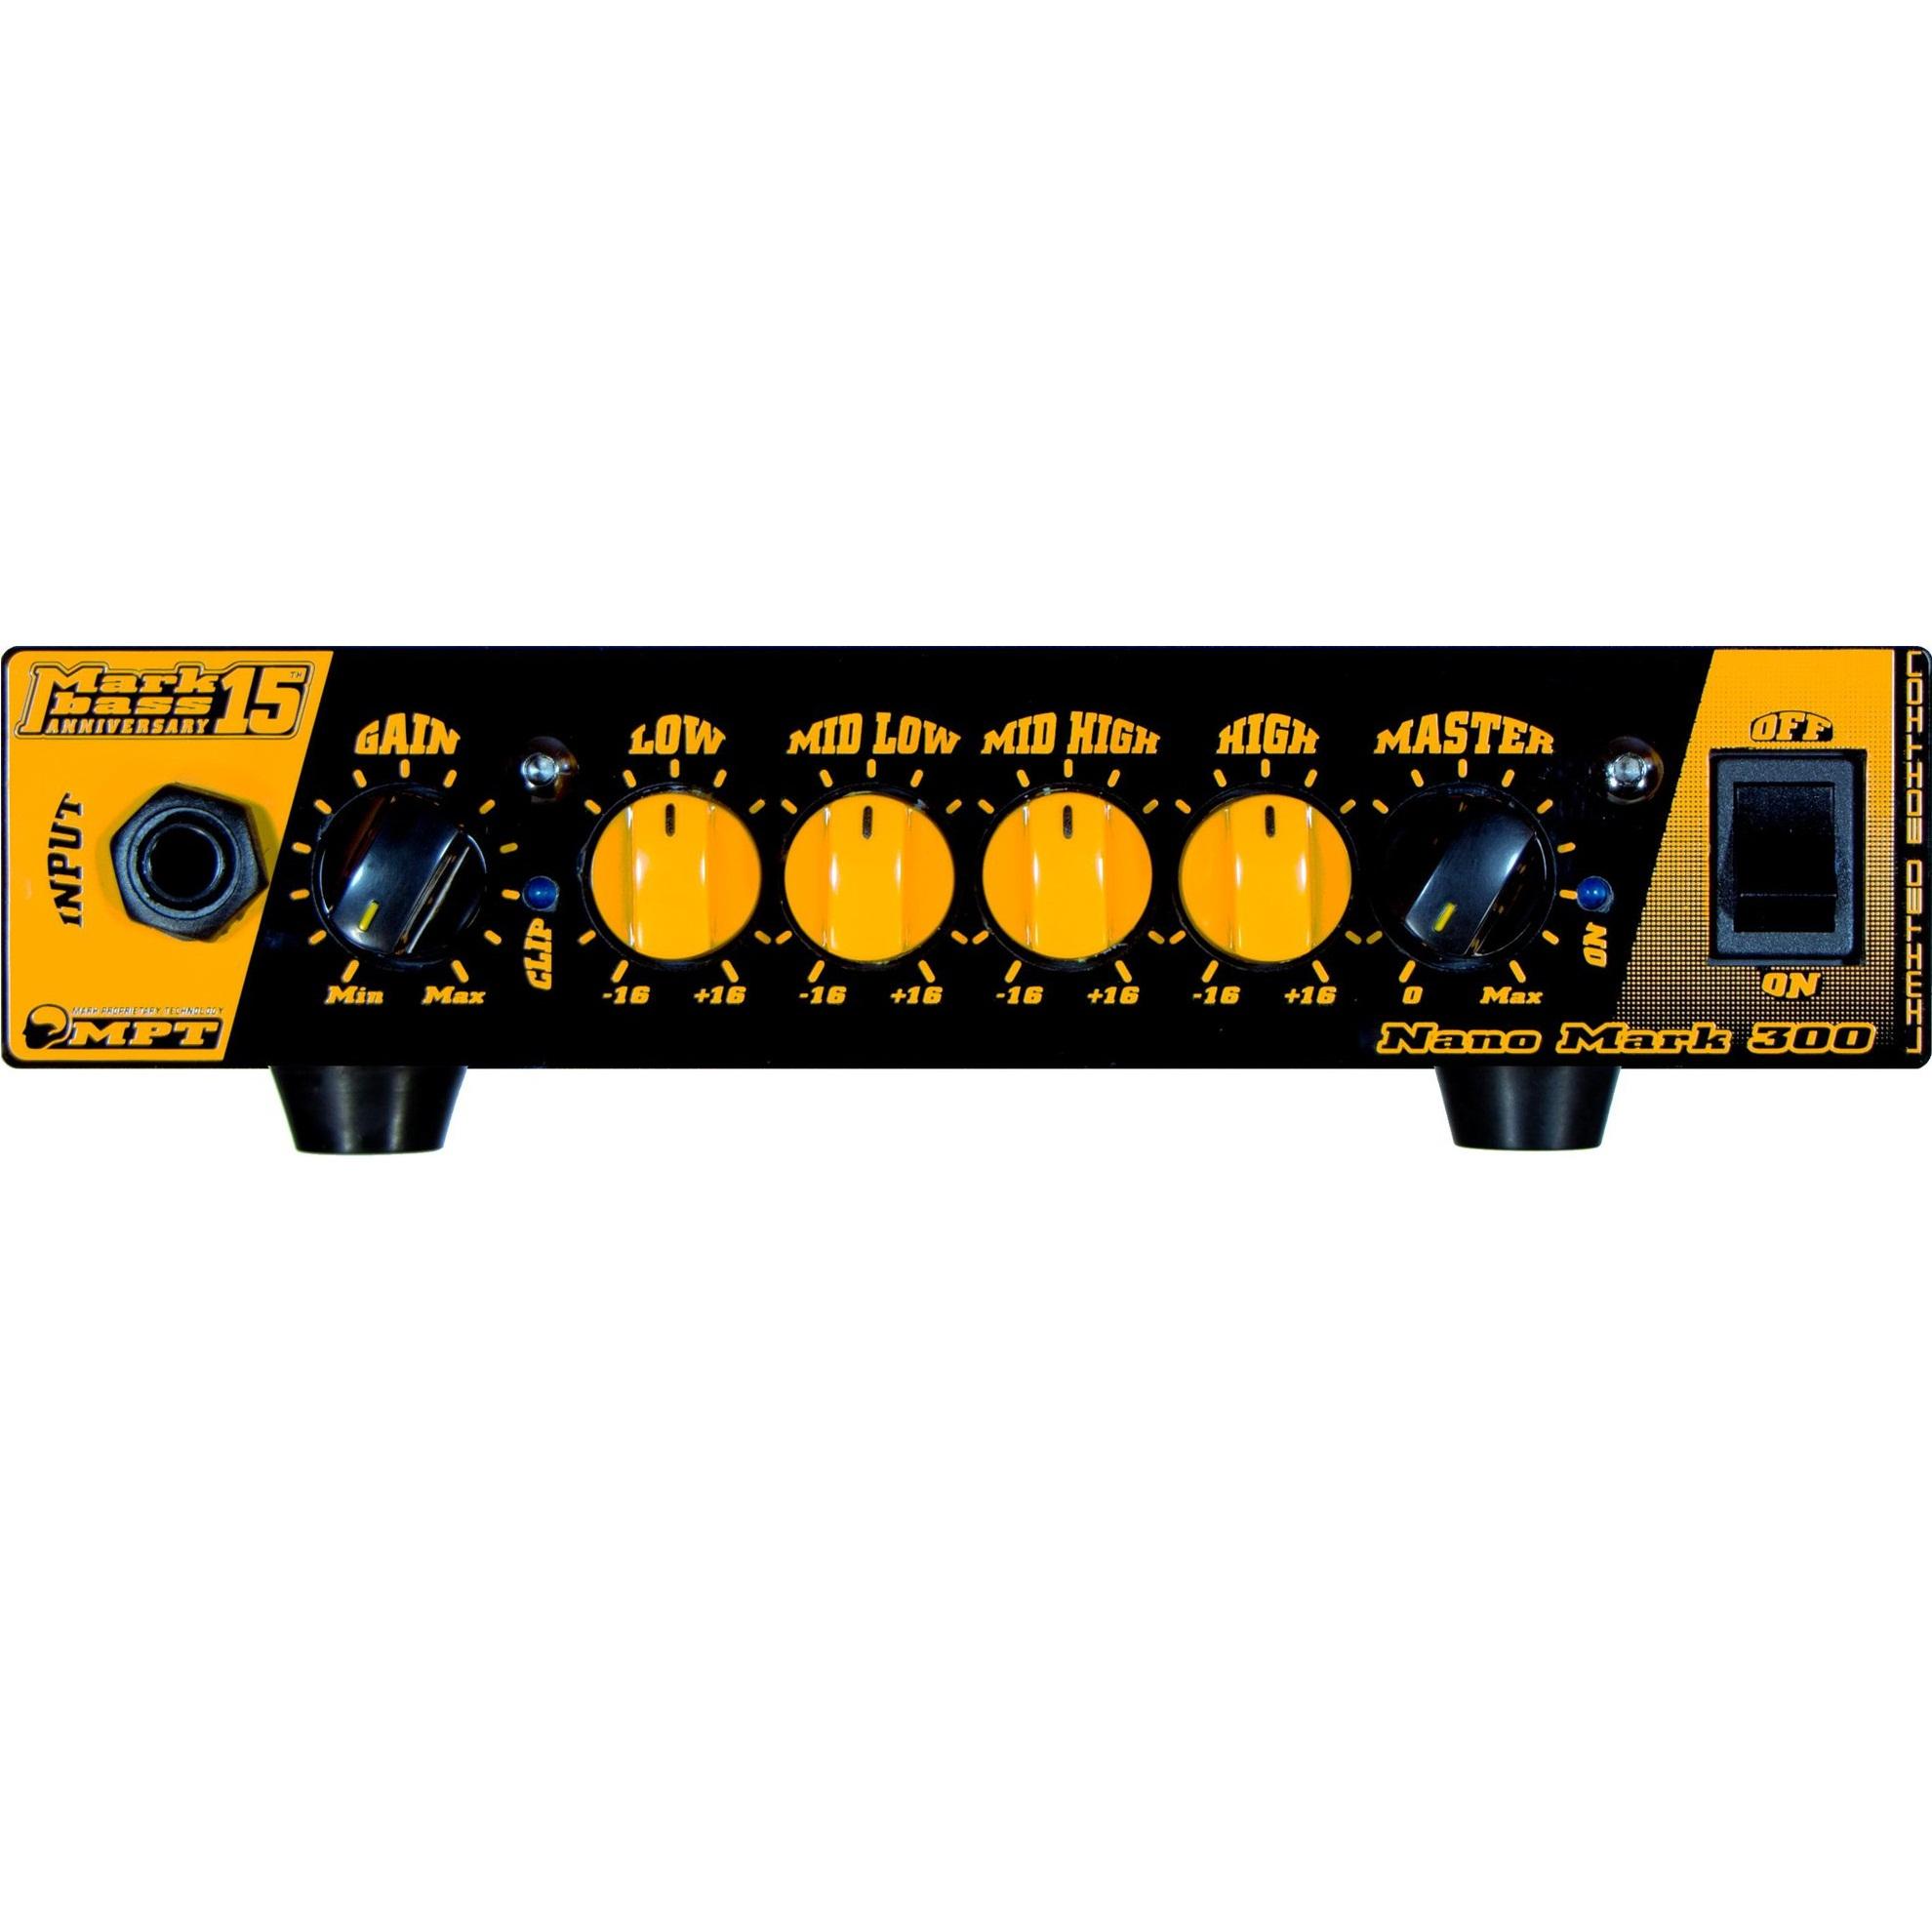 Markbass Nano Mark 300 15Th Anniversary Bass Amp Head 1